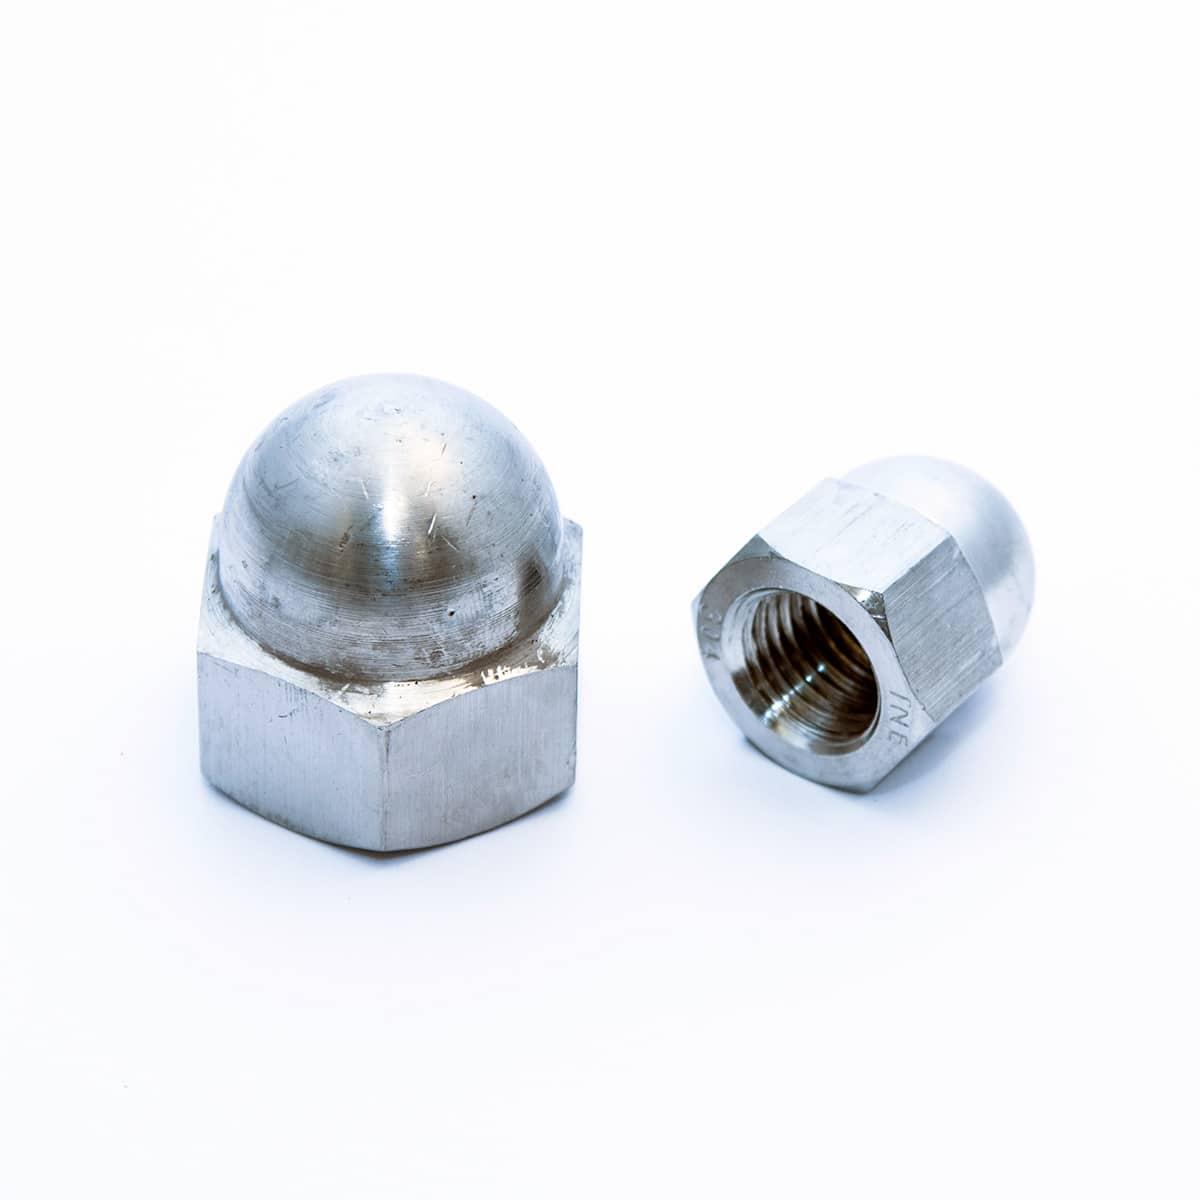 Hexagonal domed cap nuts, high type